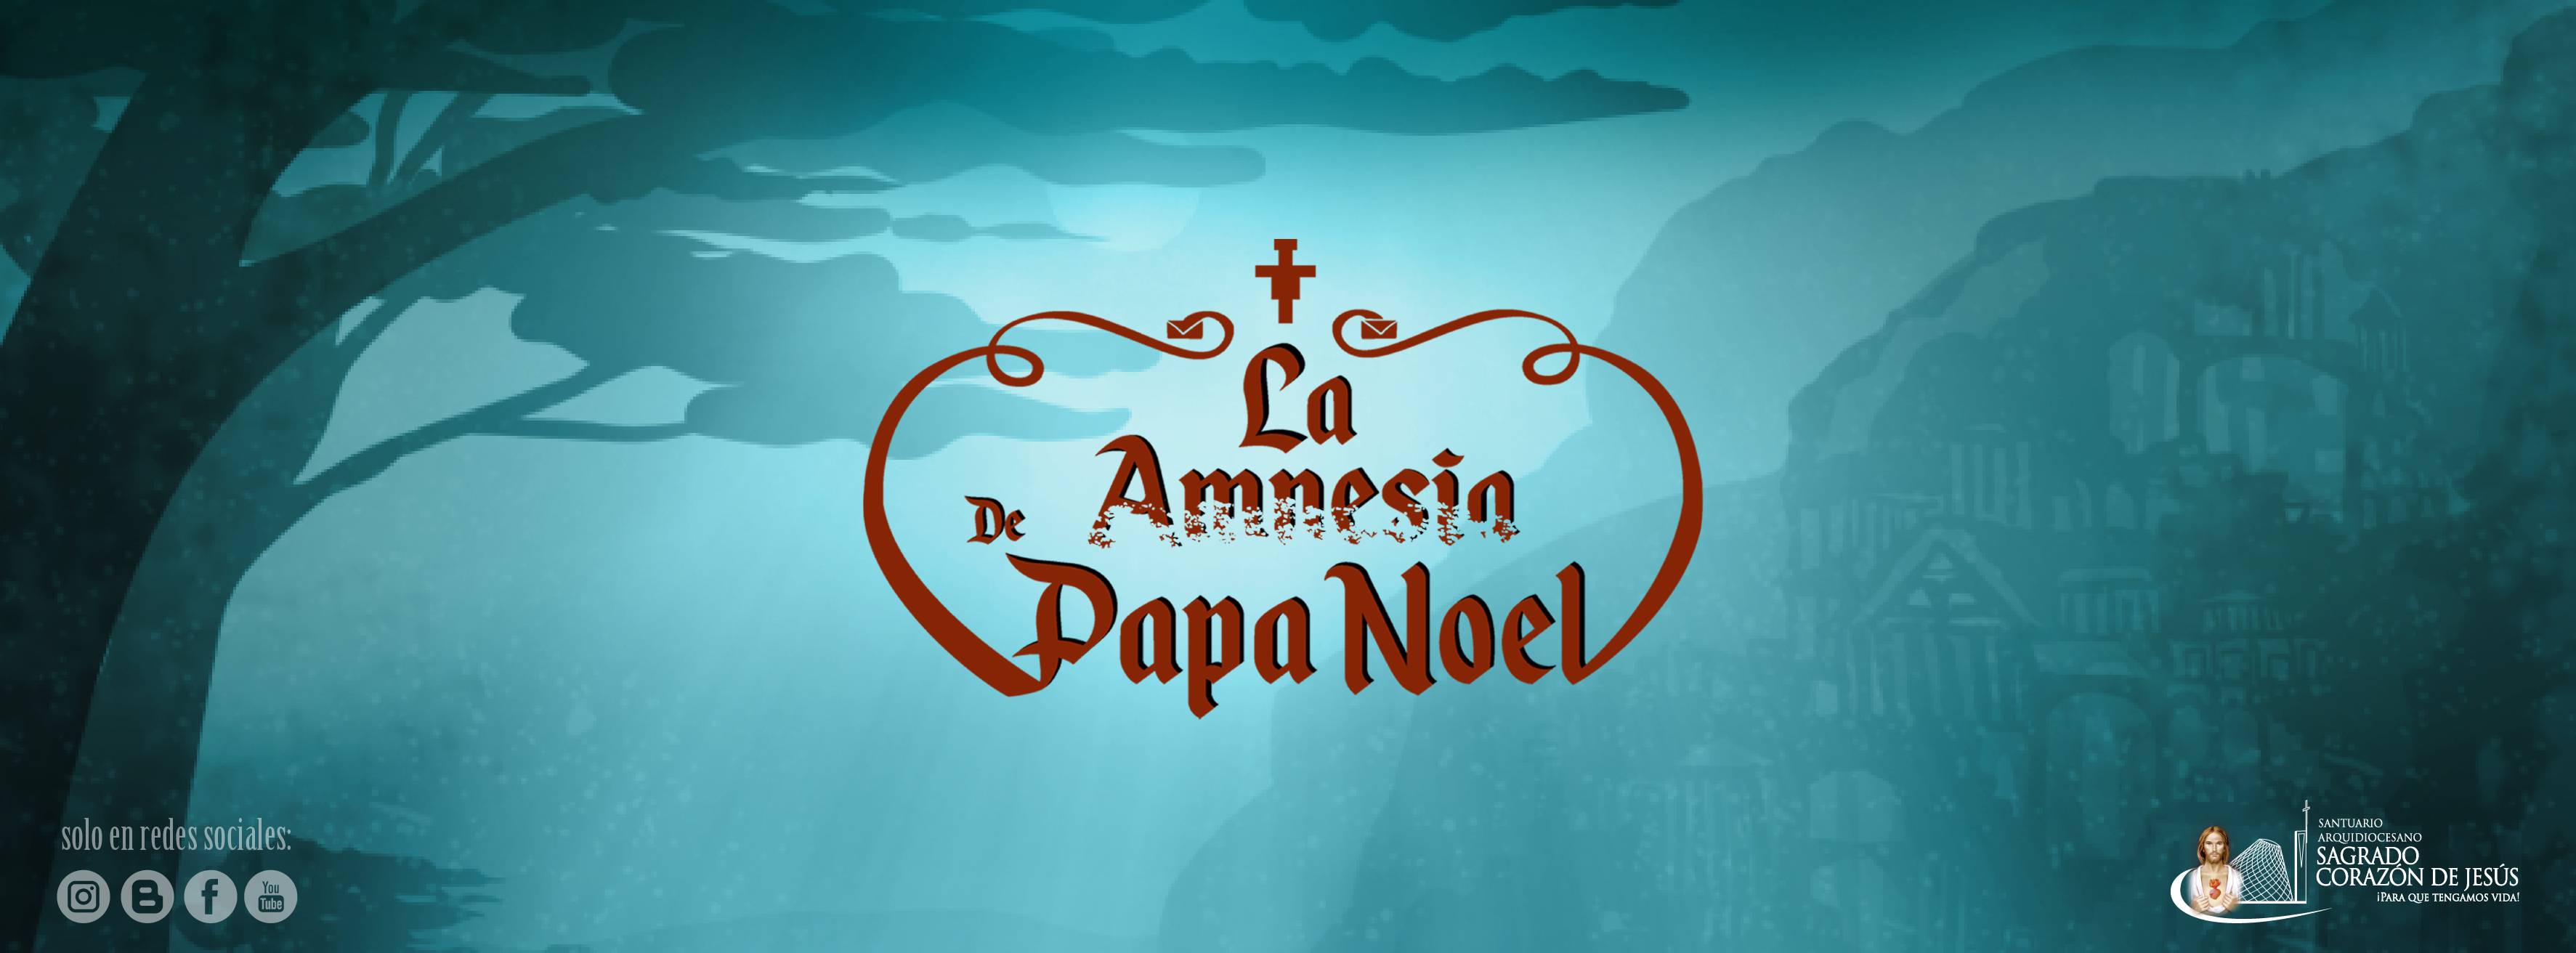 Cover La amnesia de Papa Noel solo 2 -01